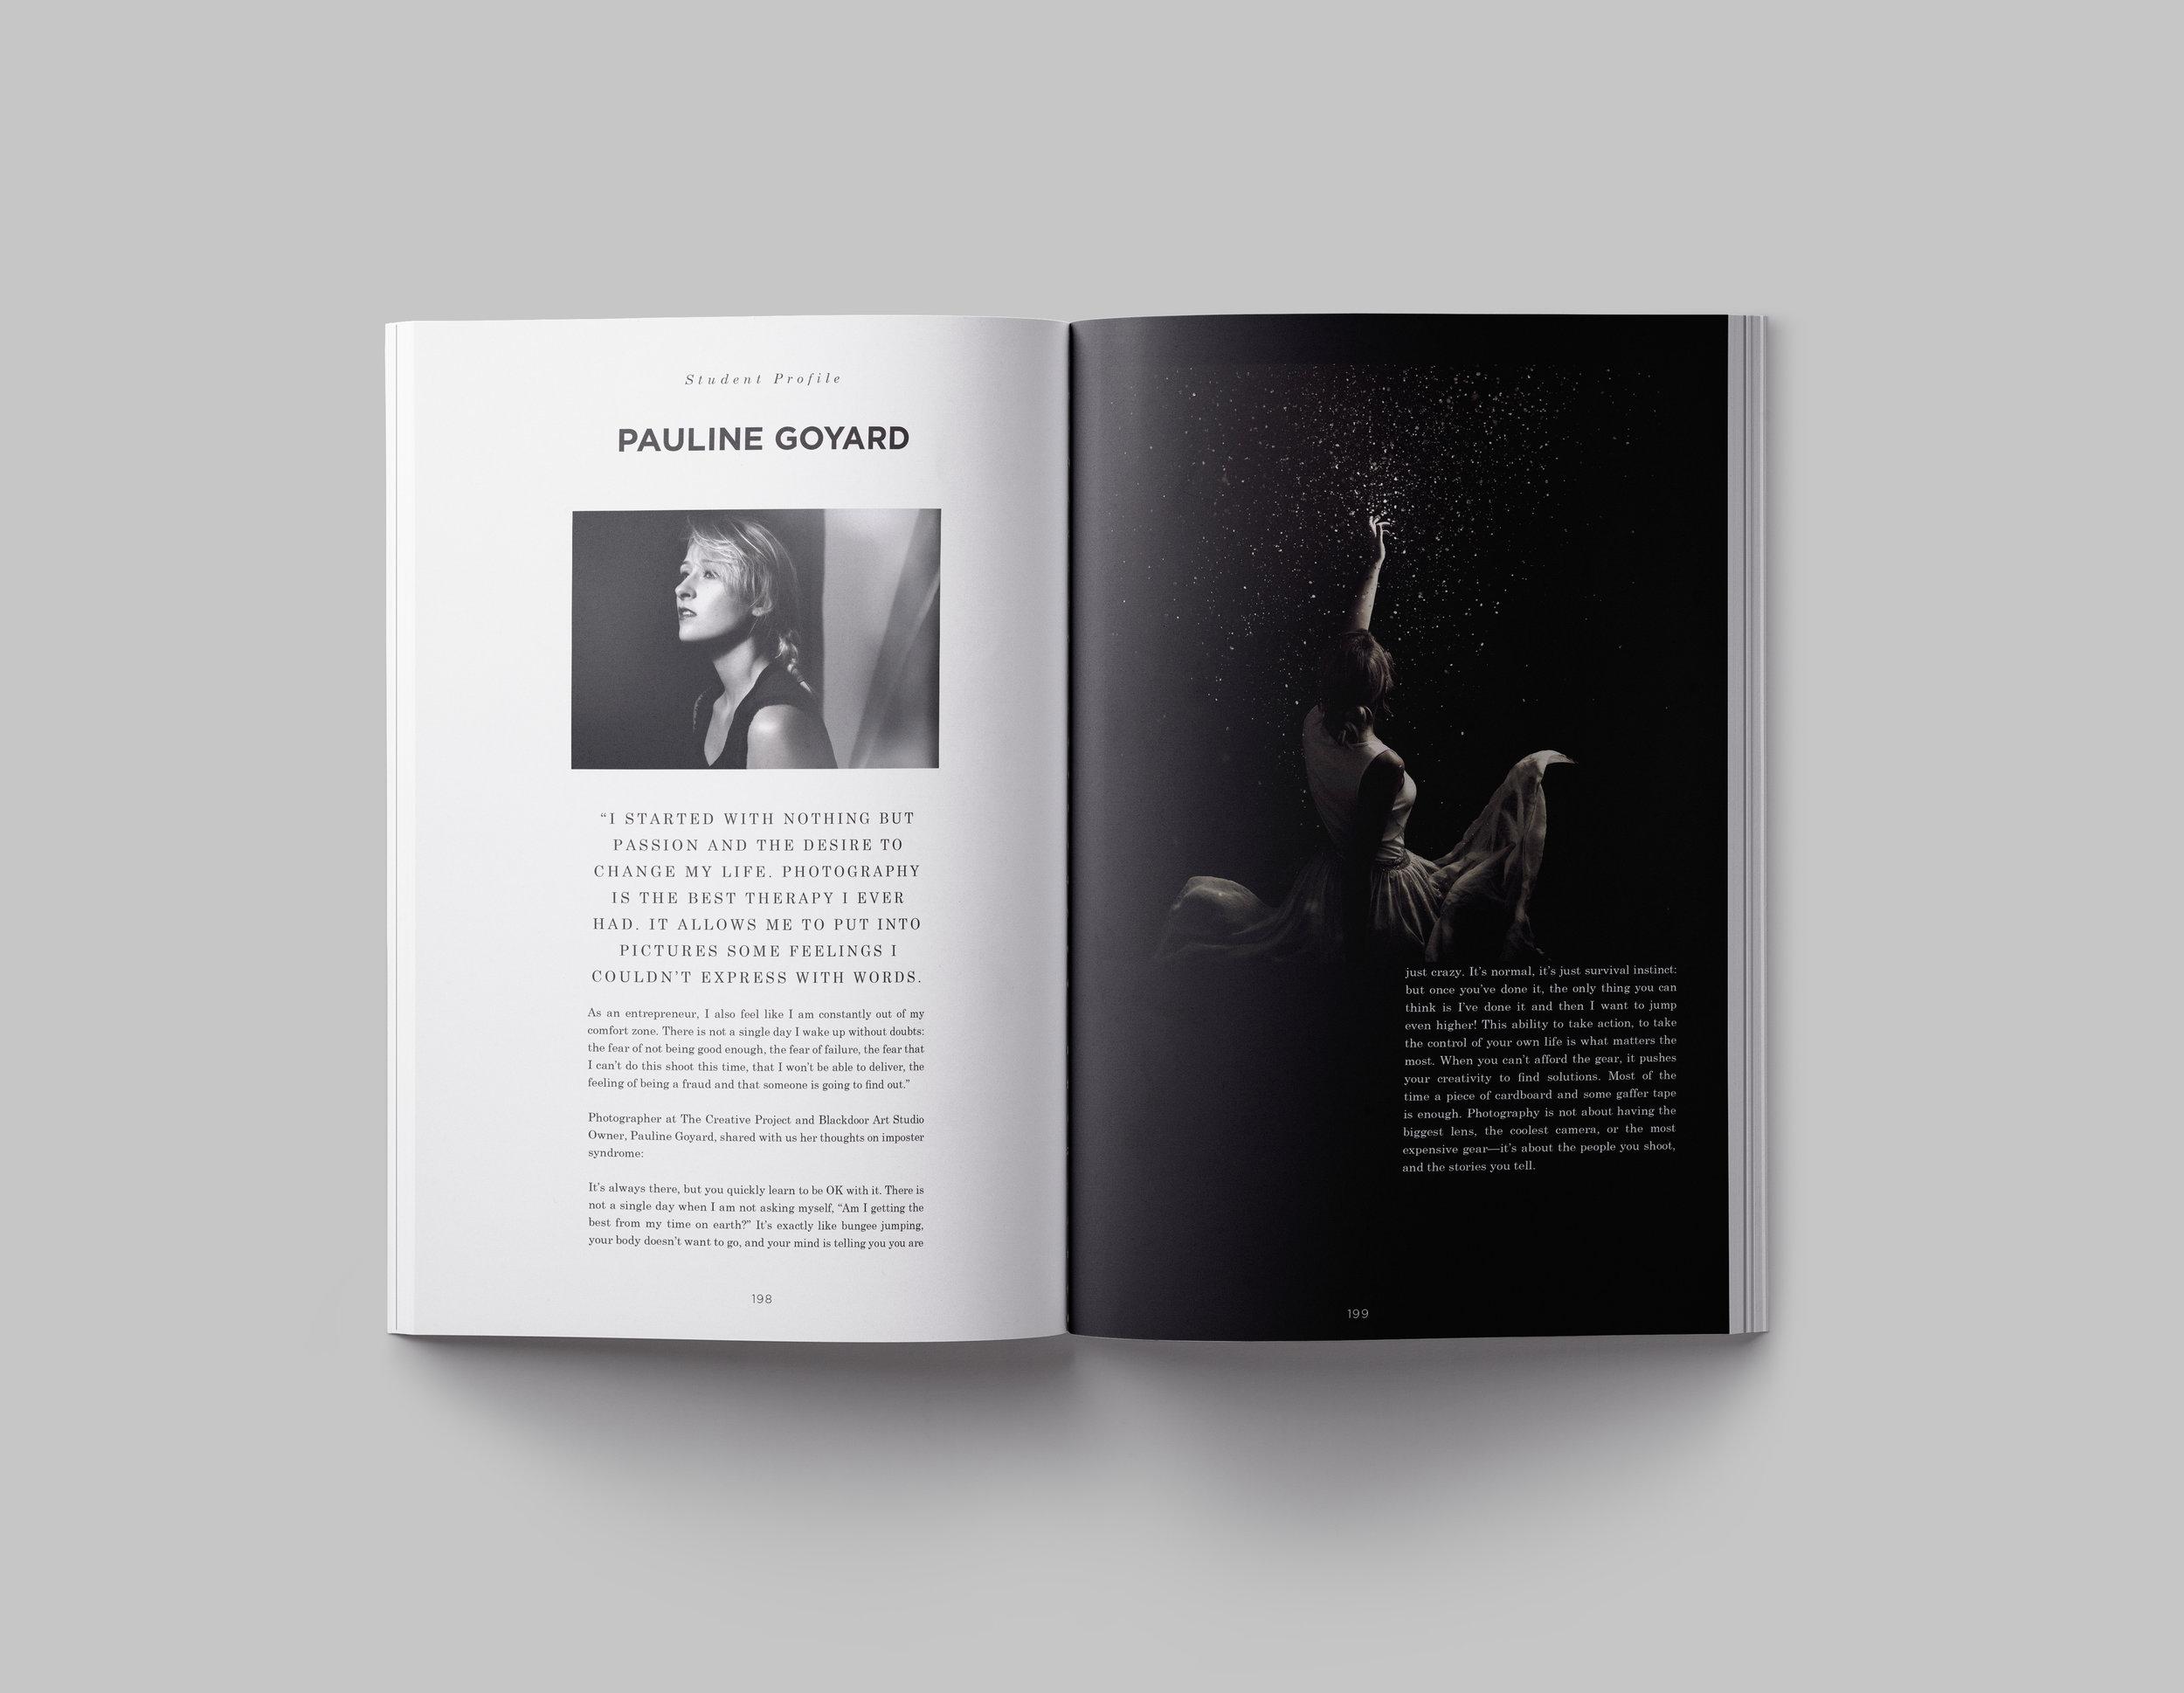 Magazine-USLetter-A4-Mockup-Template_spread11_PG.jpg